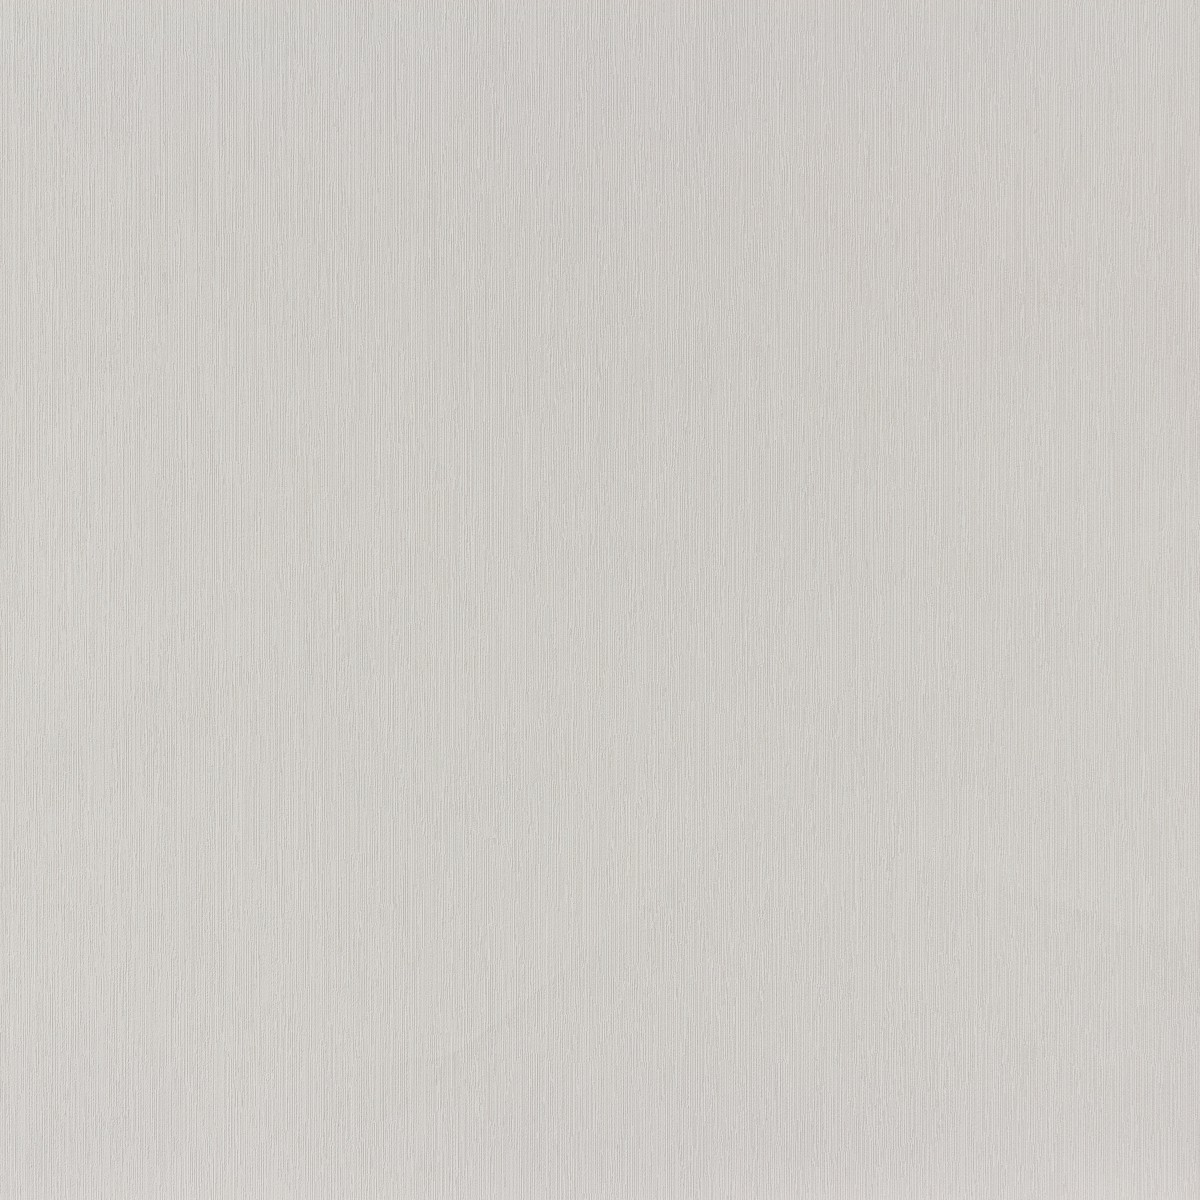 vliestapete uni grau wei di moda marburg 54201. Black Bedroom Furniture Sets. Home Design Ideas